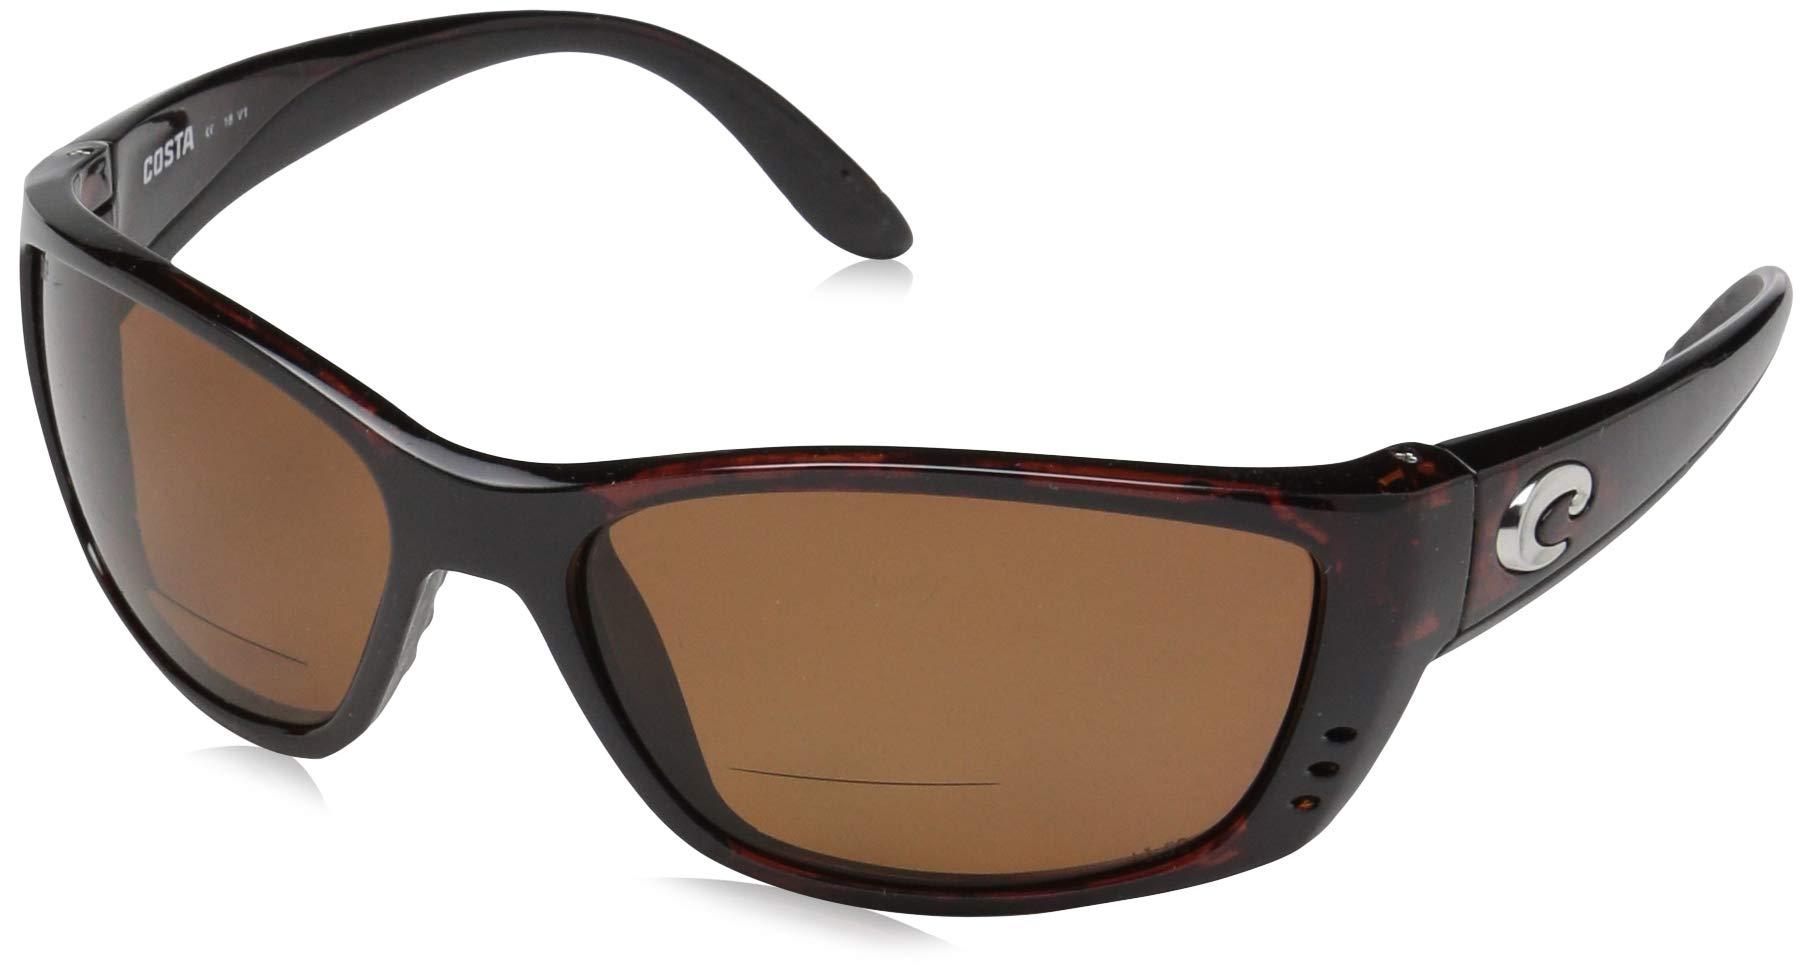 Costa Del Mar Fisch Sunglasses, Tortoise, Gray 580P Lens by Costa Del Mar